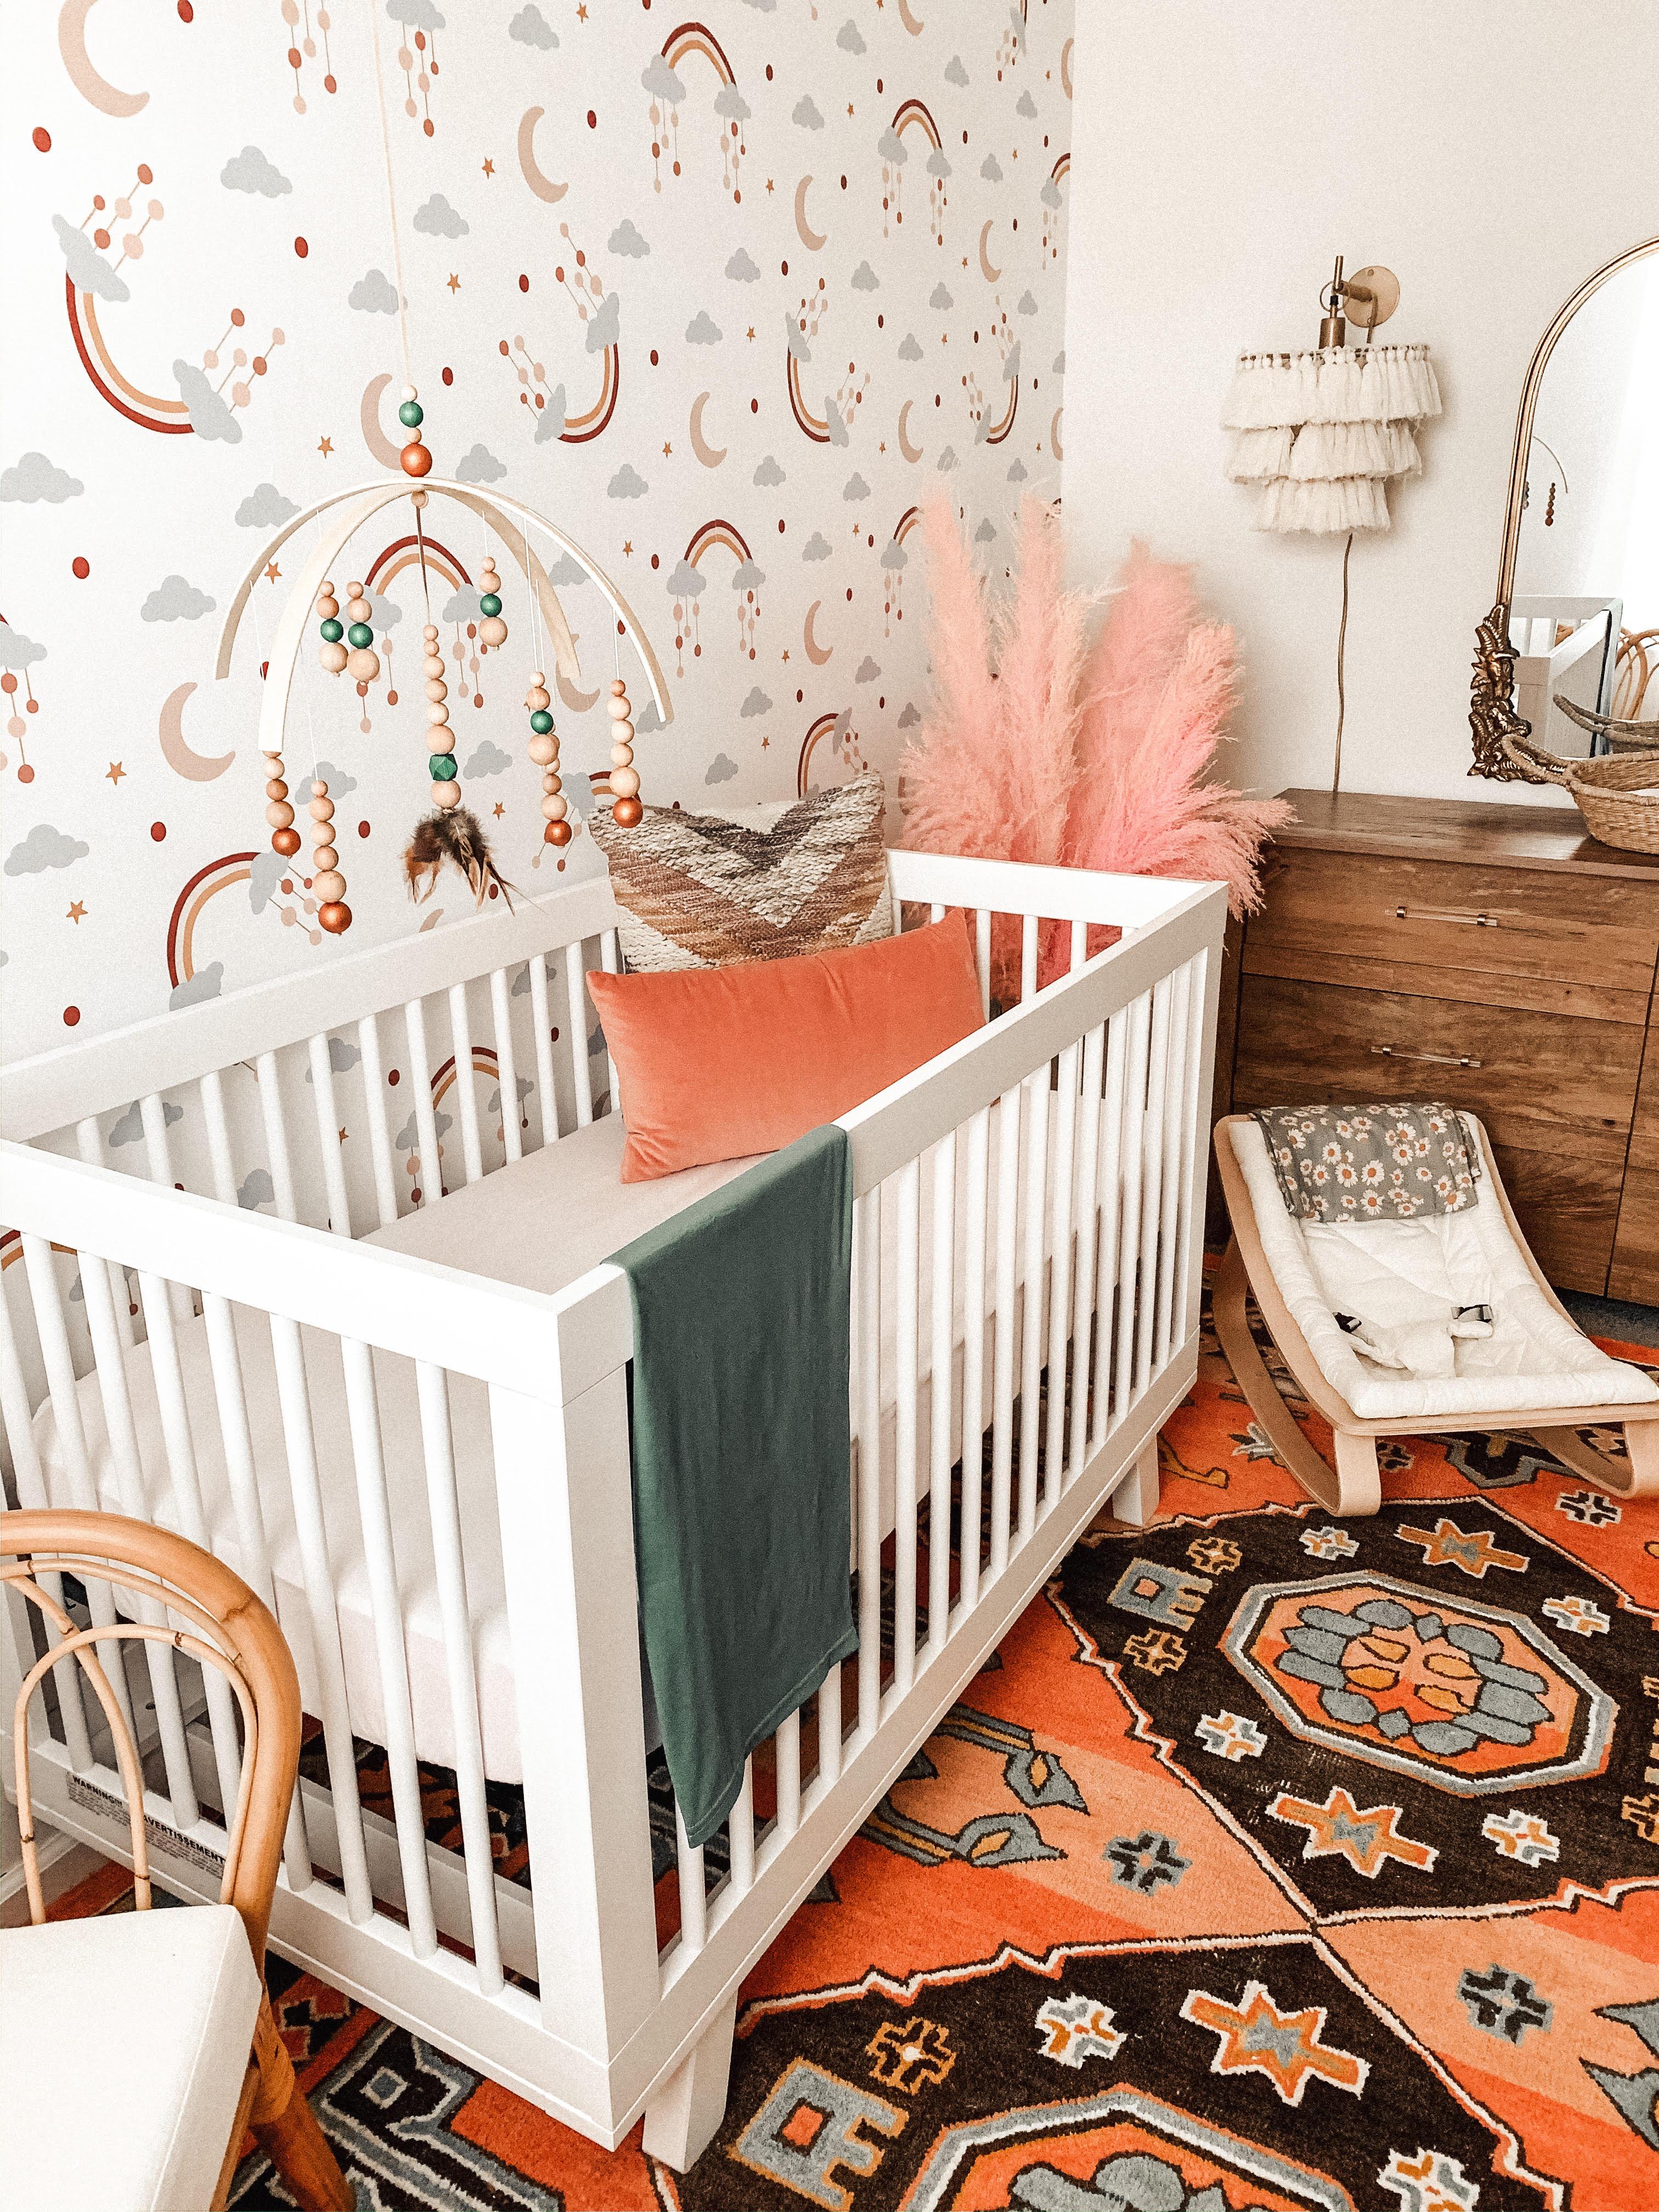 Muted Rainbow Cloud Wallpaper in Baby Girl Nursery